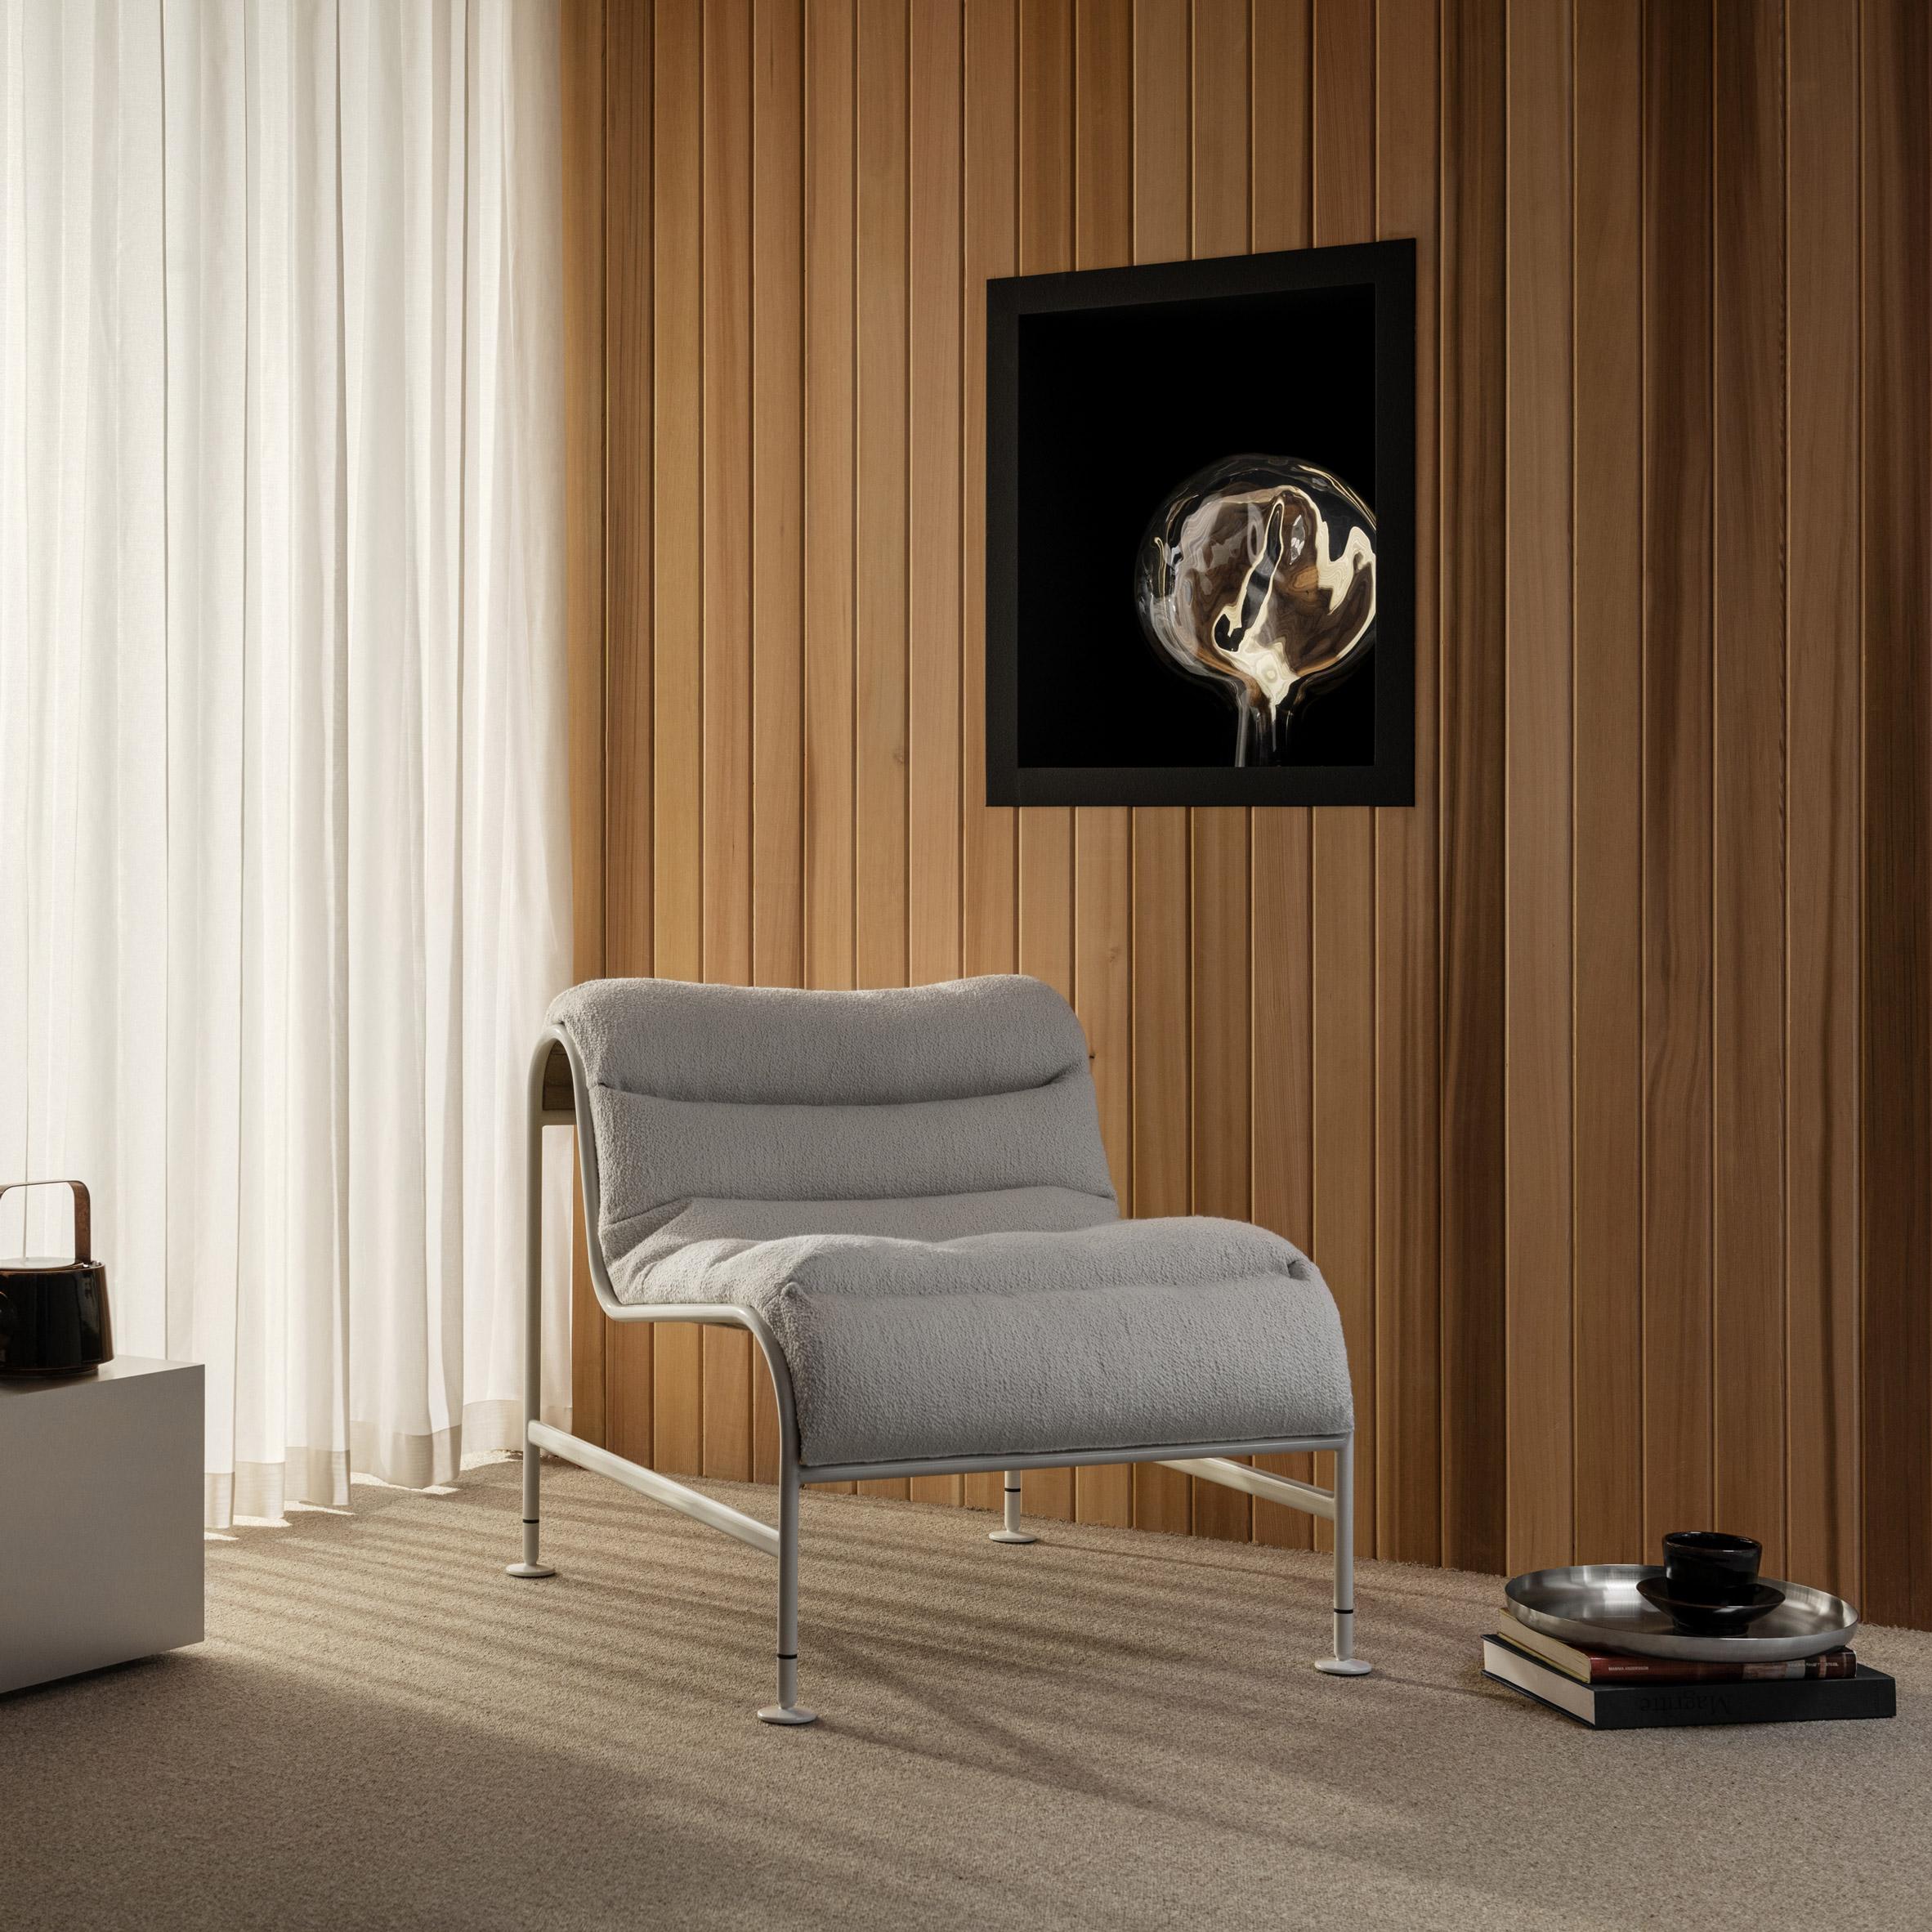 Sunny seating by Note Design Studio x Gunilla Allard for Lammhults